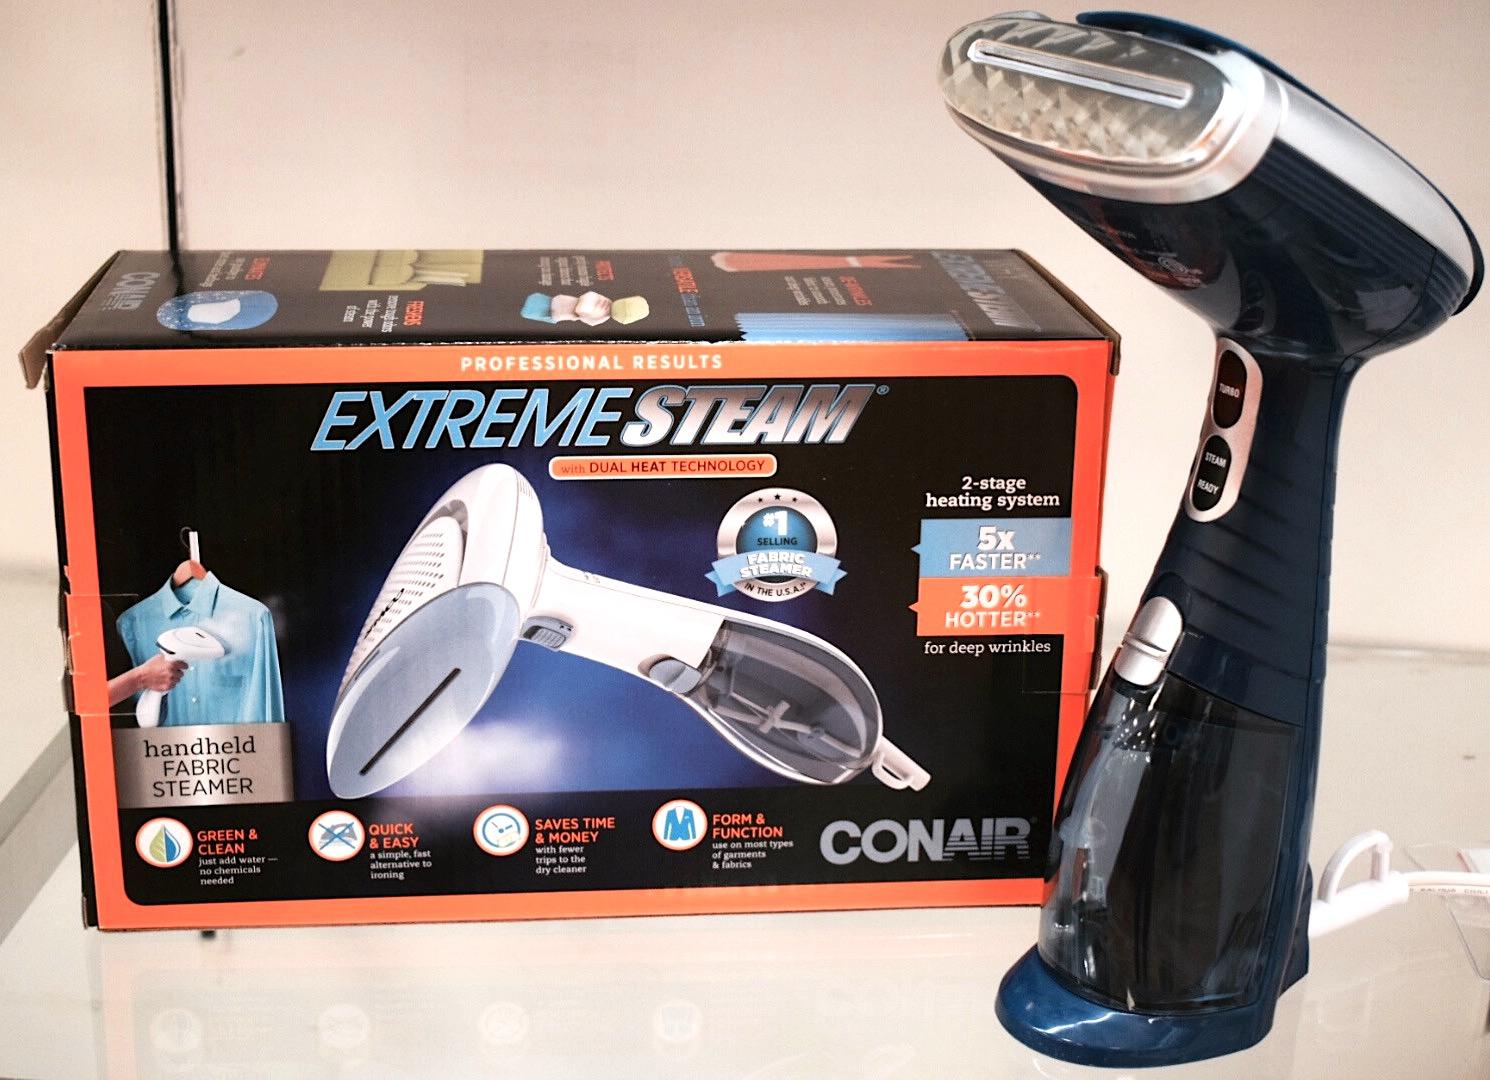 Conair Extreme Steam Steamer at Macys .com